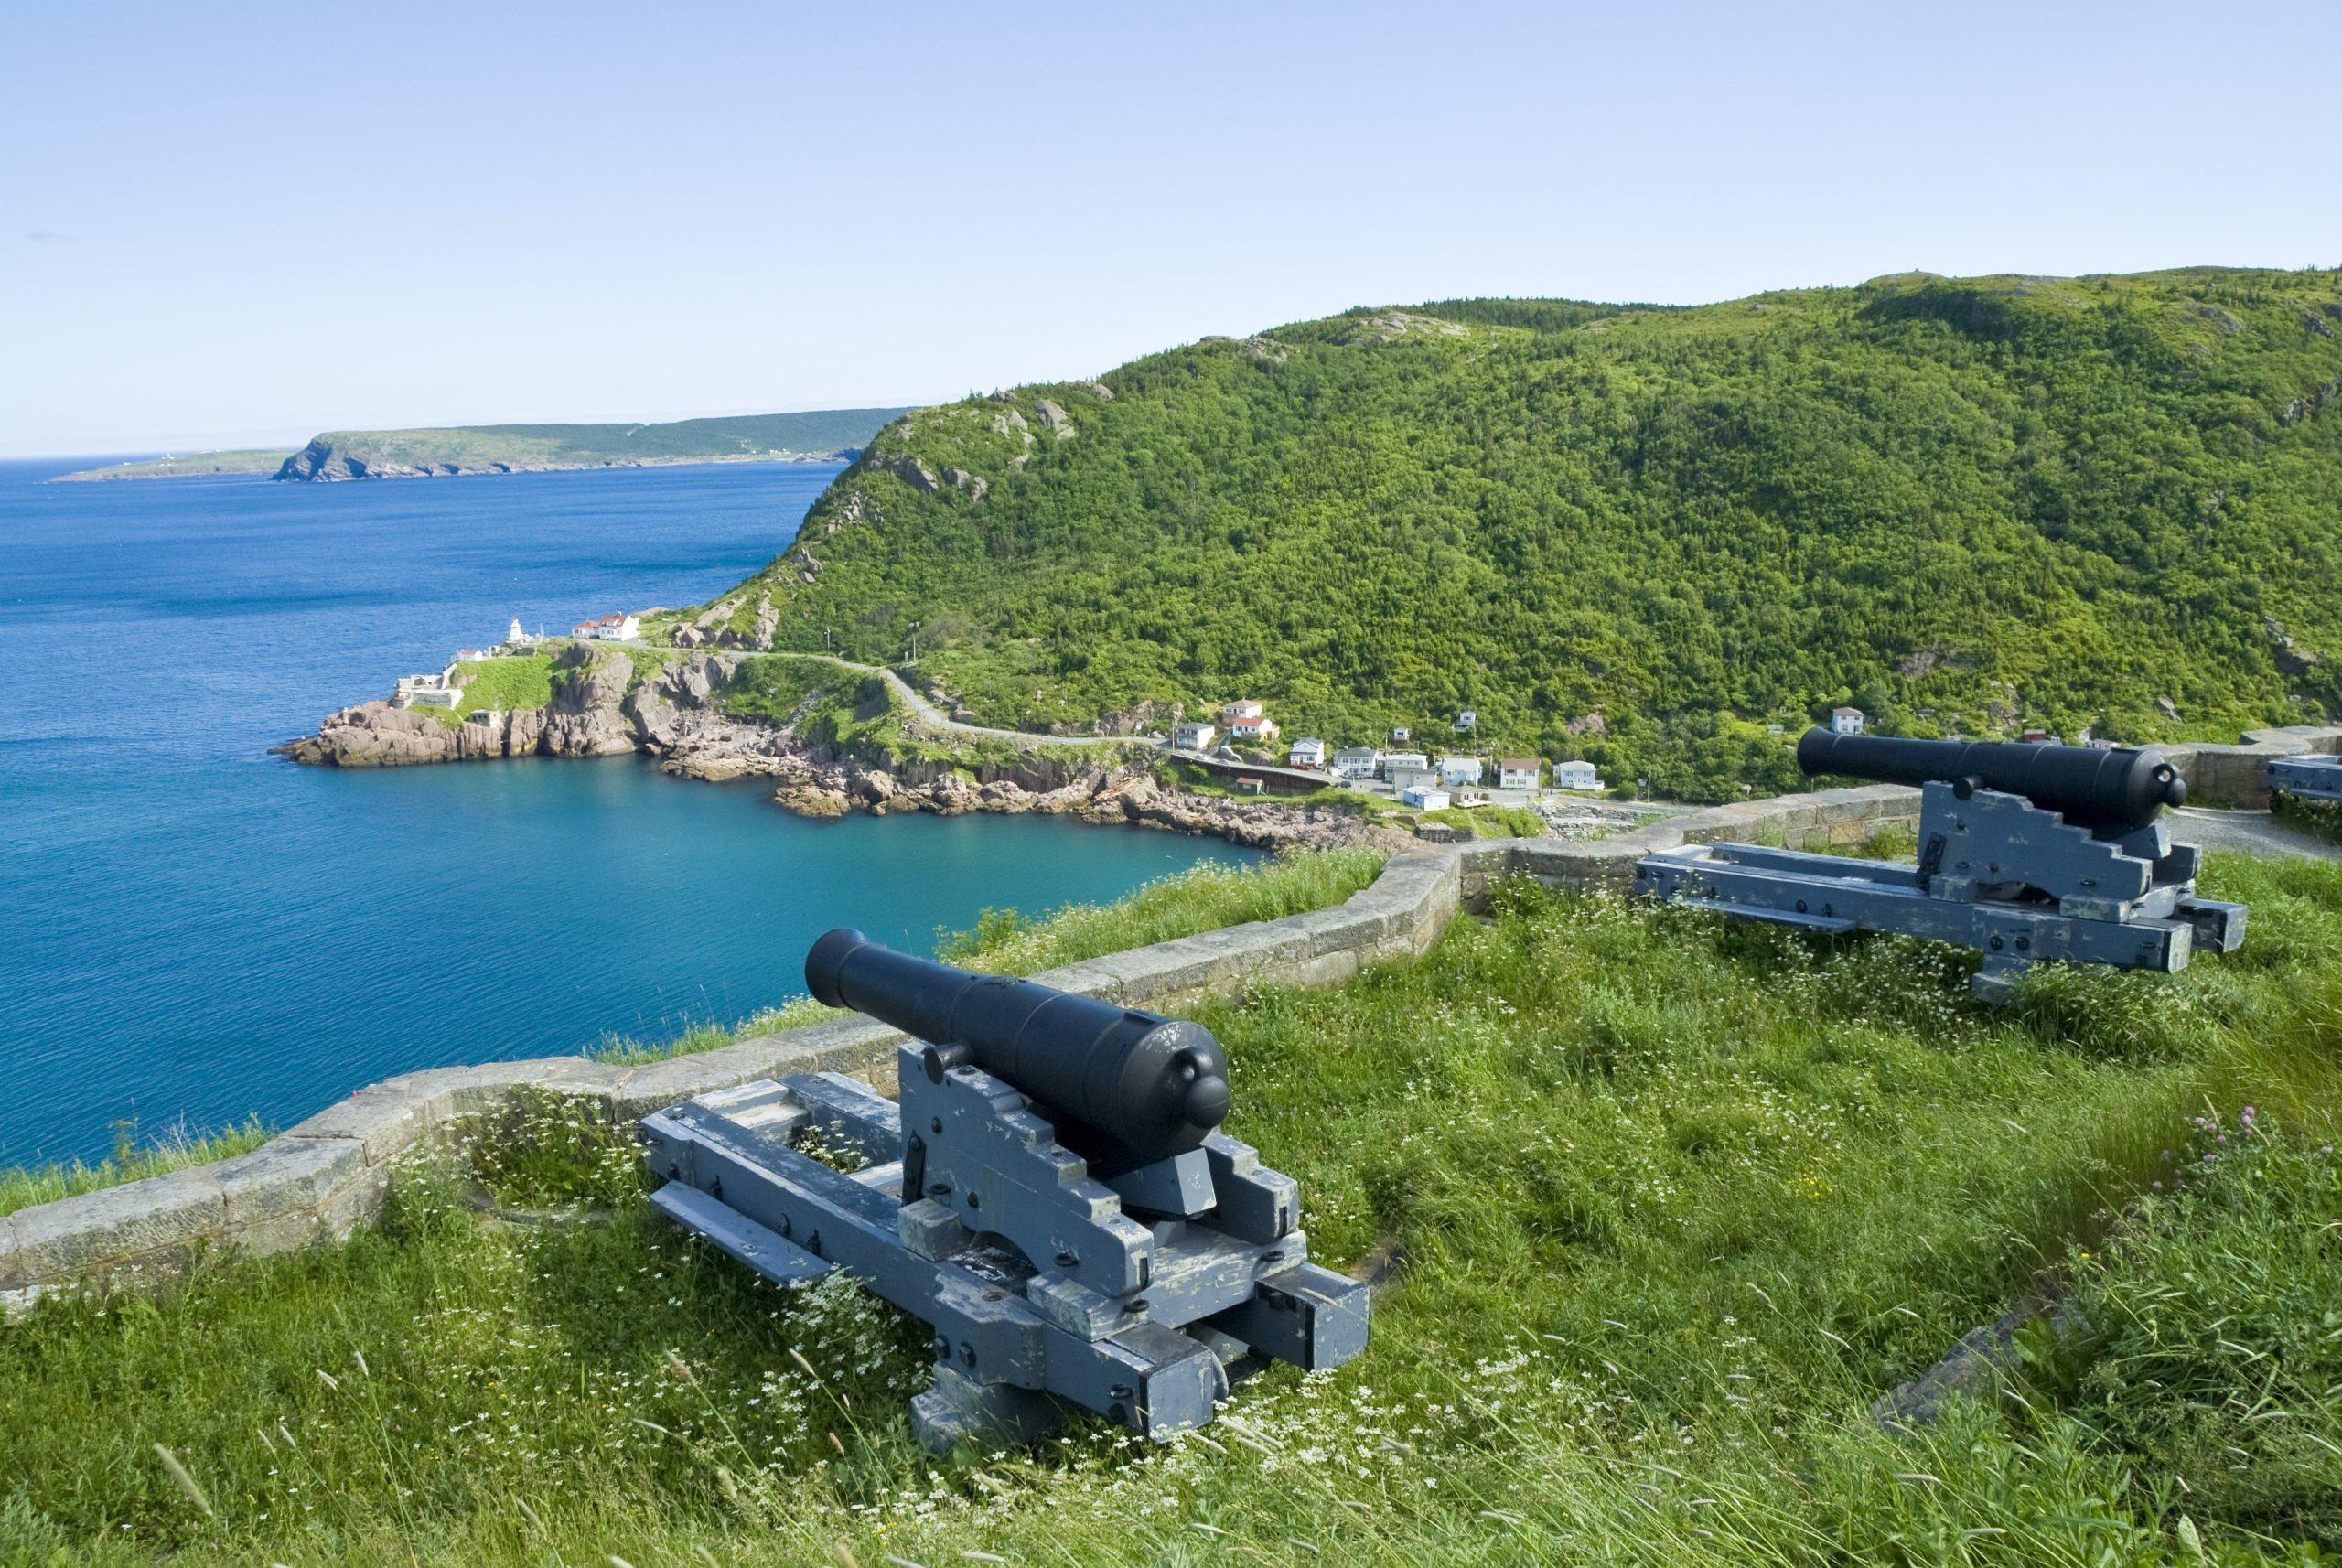 Big Canons on Signal Hill, St. John's